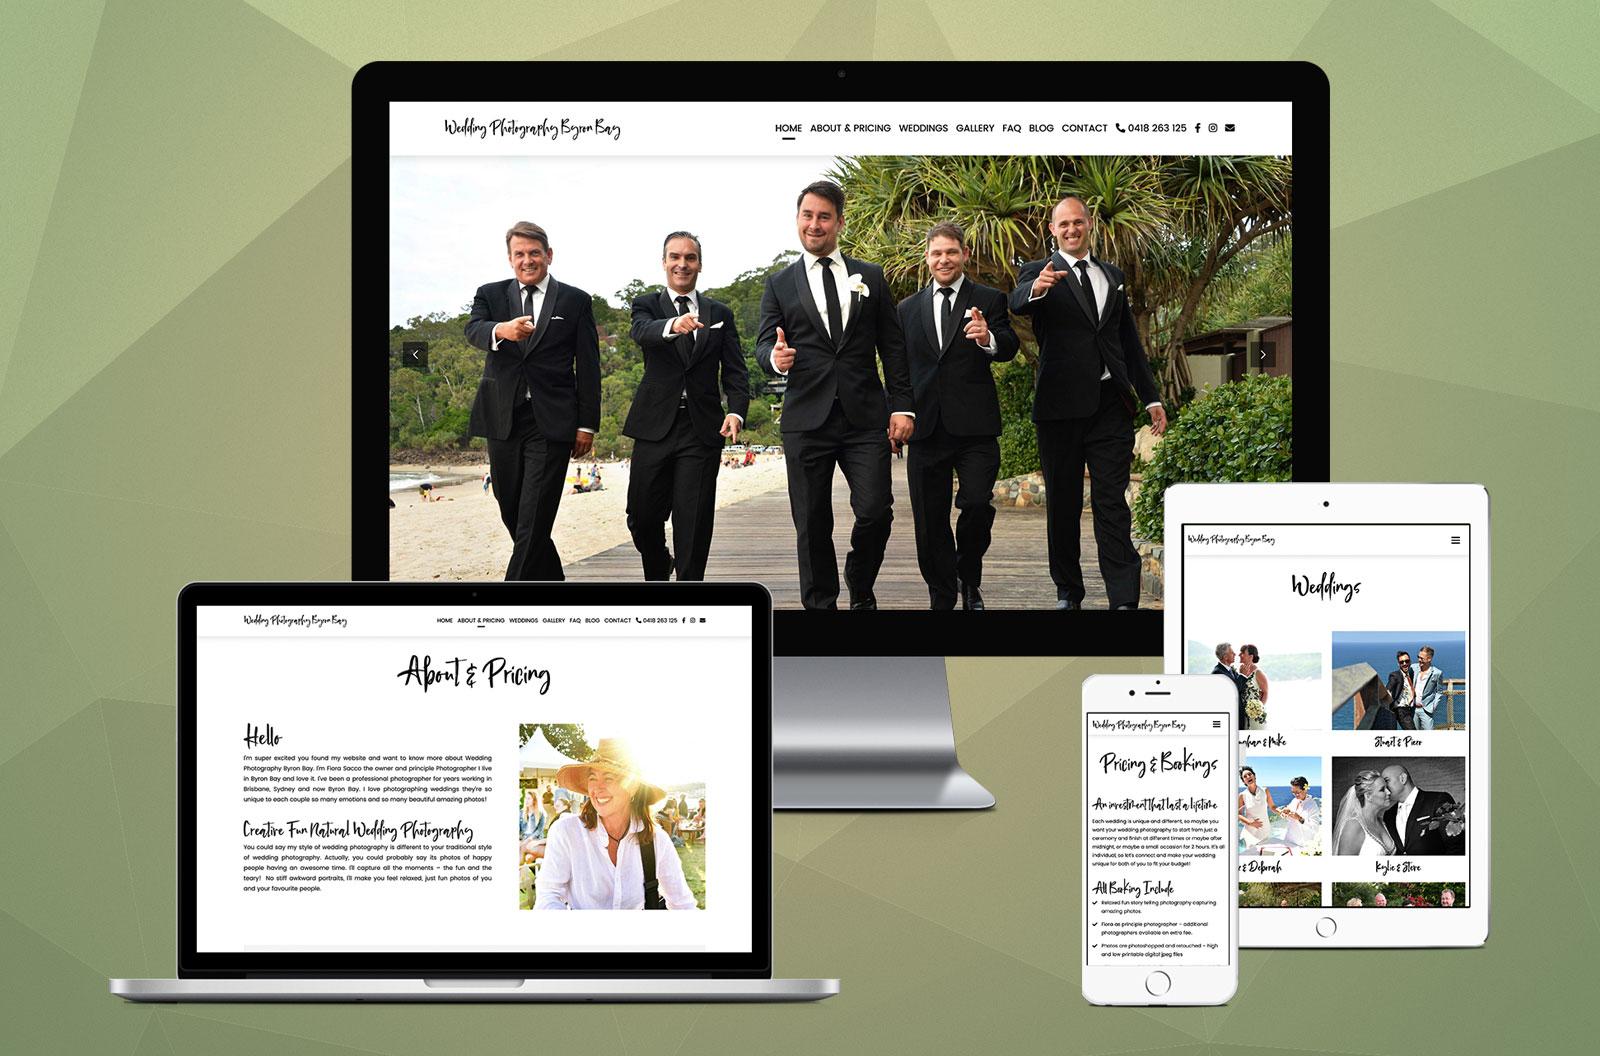 Wedding Photography Byron Bay - Website Design Robert Mullineux